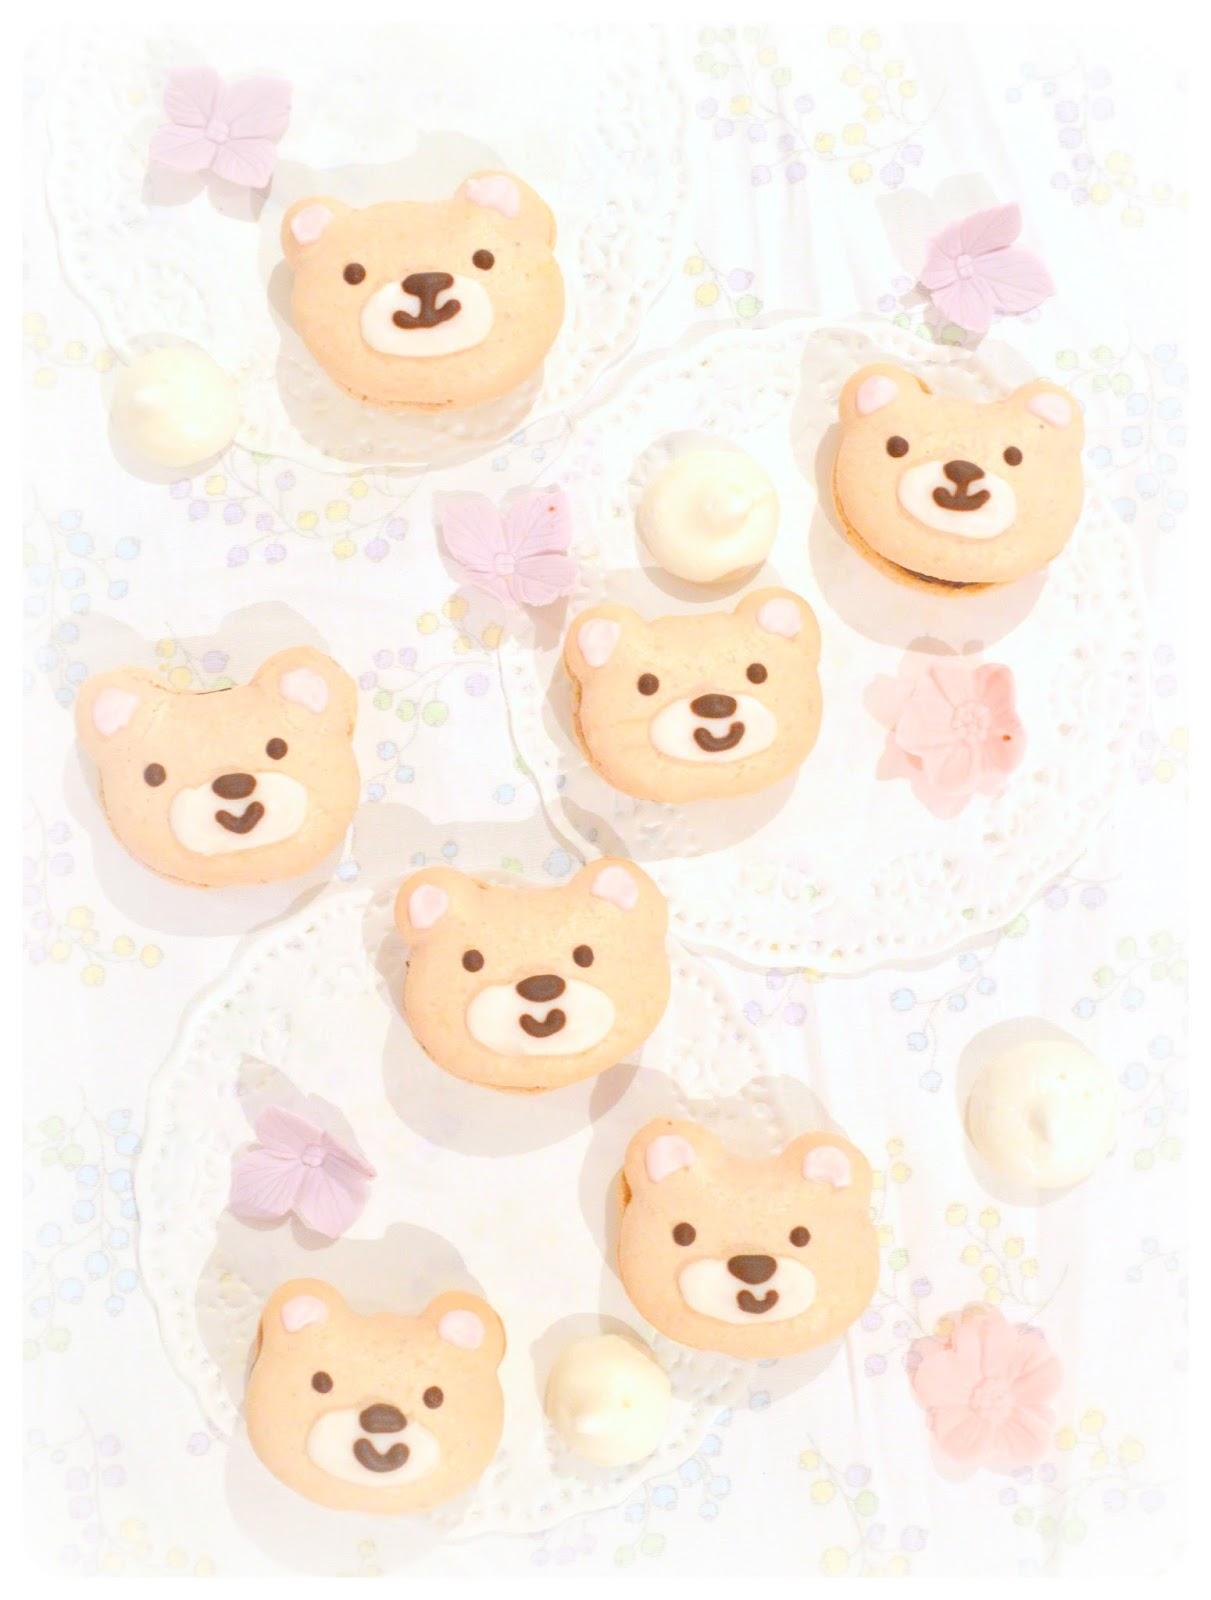 Teddy Bear Chocolate Macarons Cherie Kelly Cake London